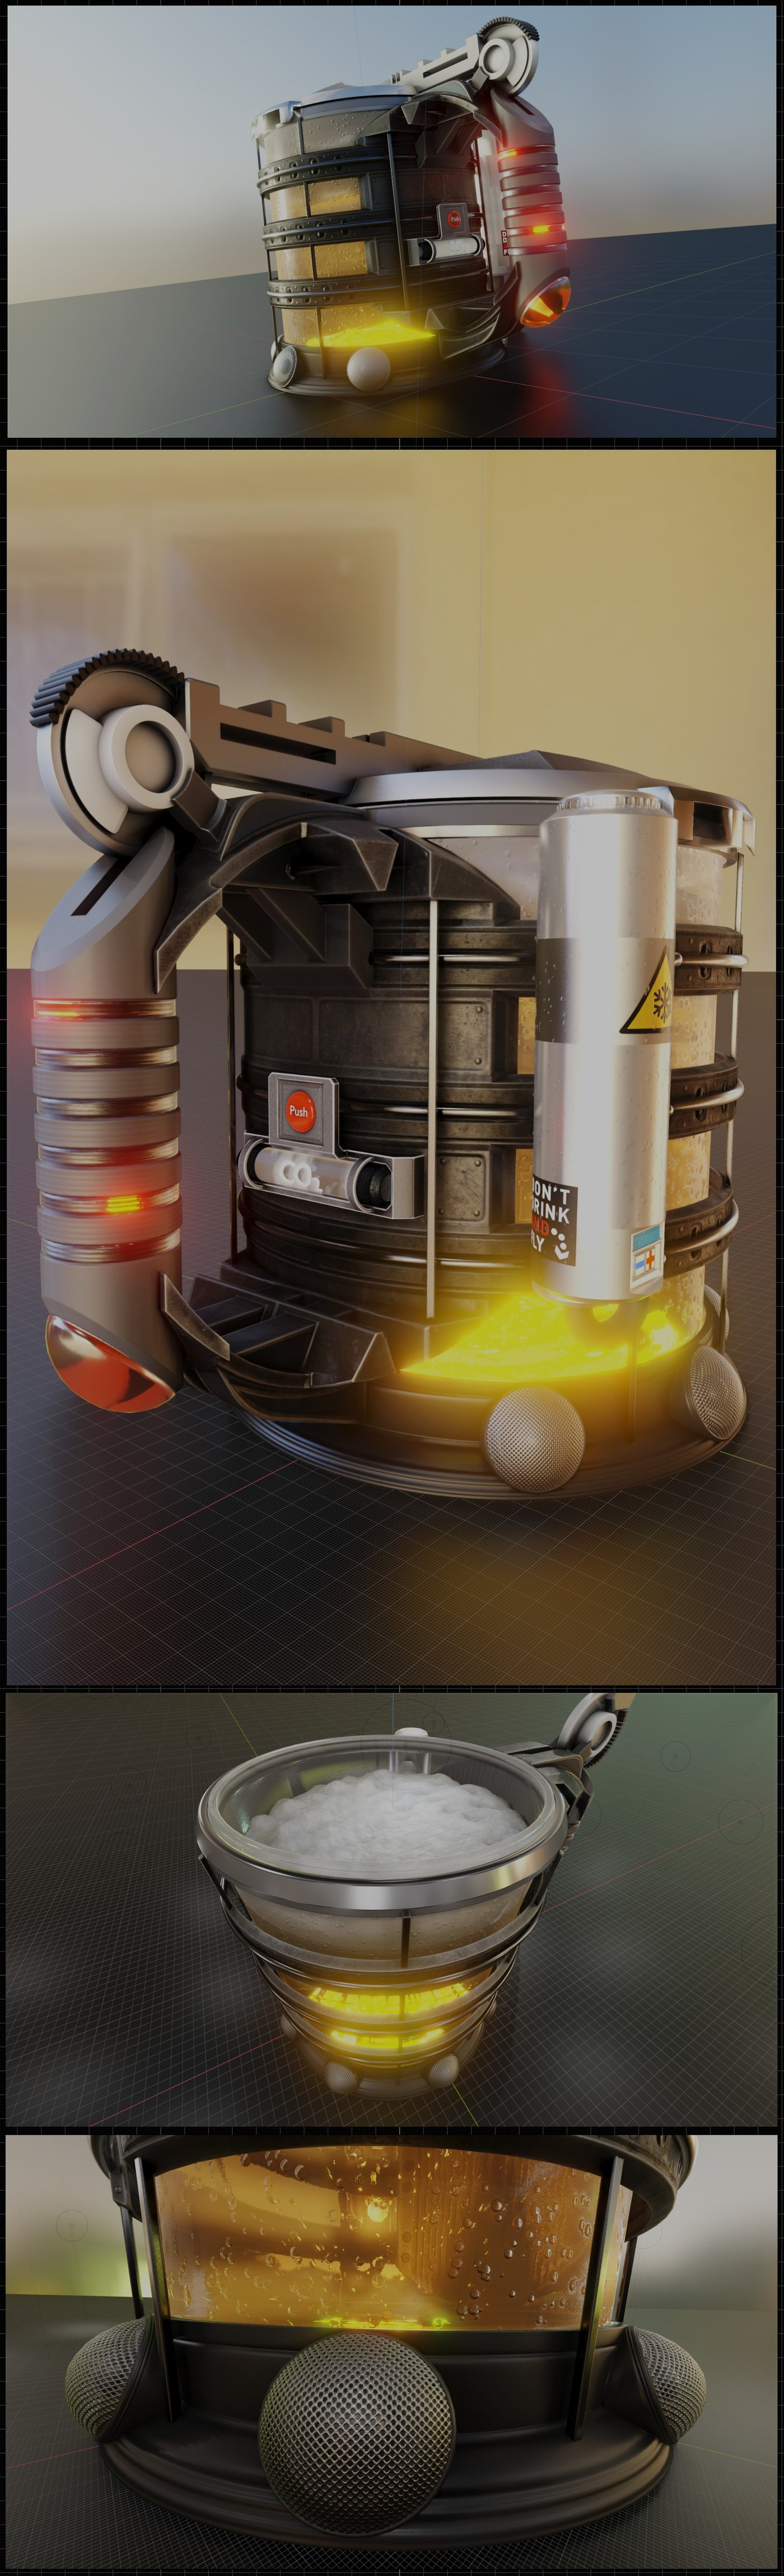 The Infinite Beer Mug From The Future (Wip-76) Blender-2.90.1